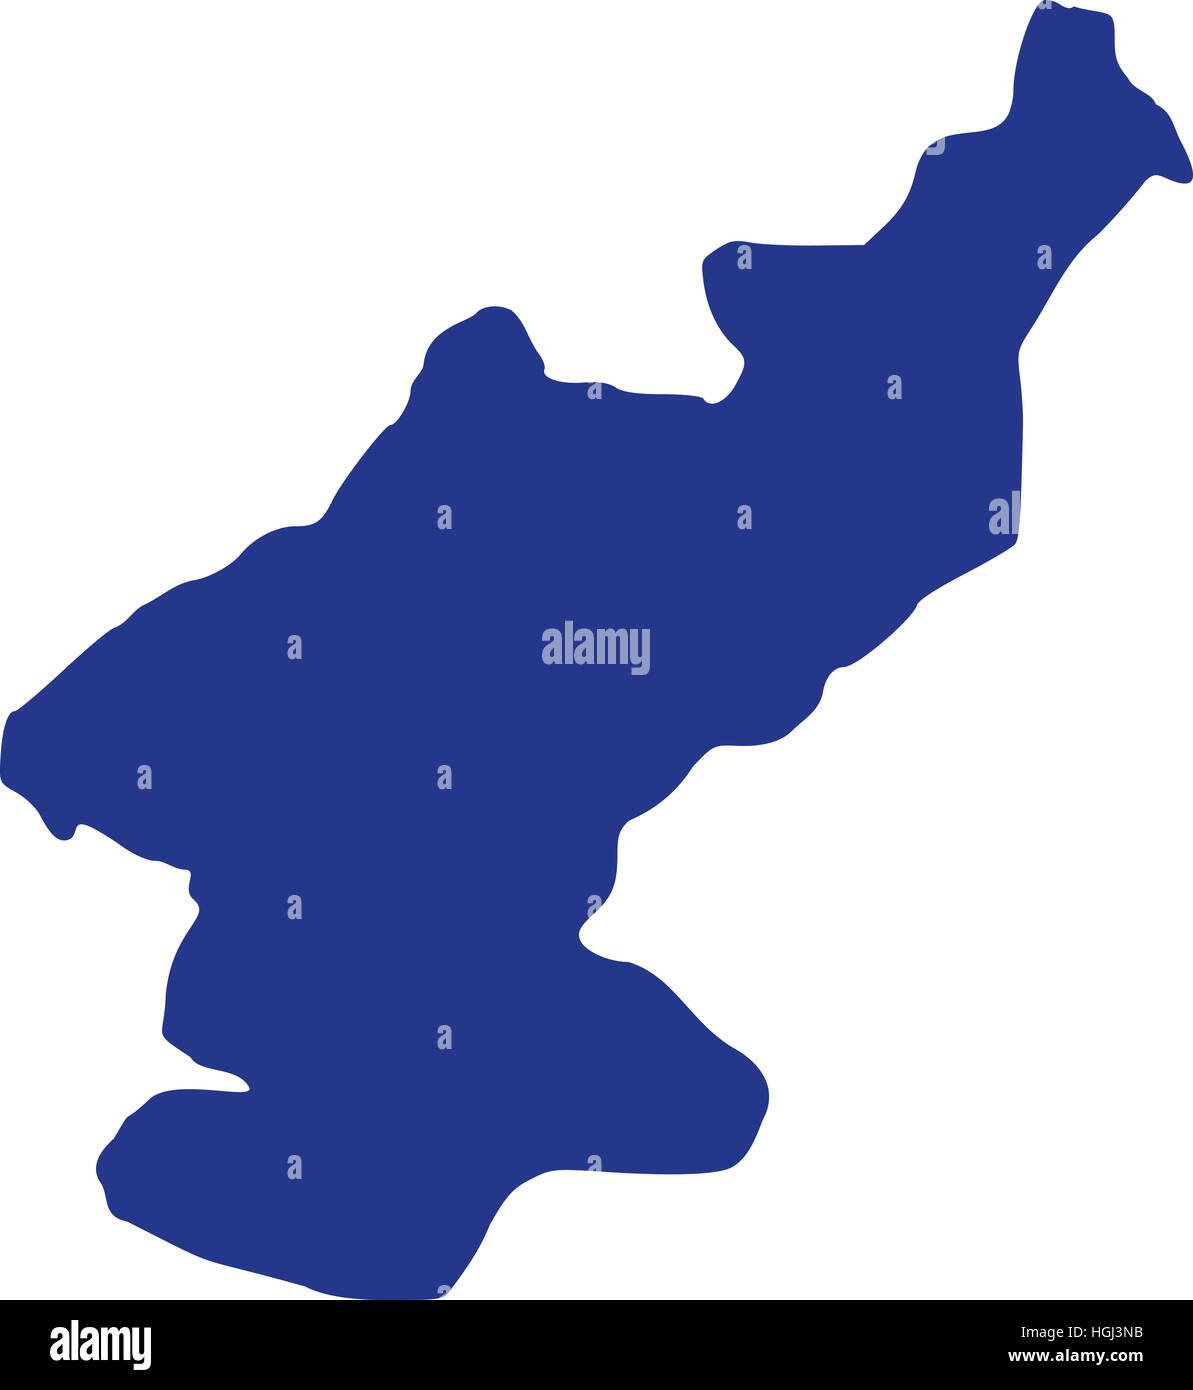 North Korea Map Stock Photo 130705159 Alamy